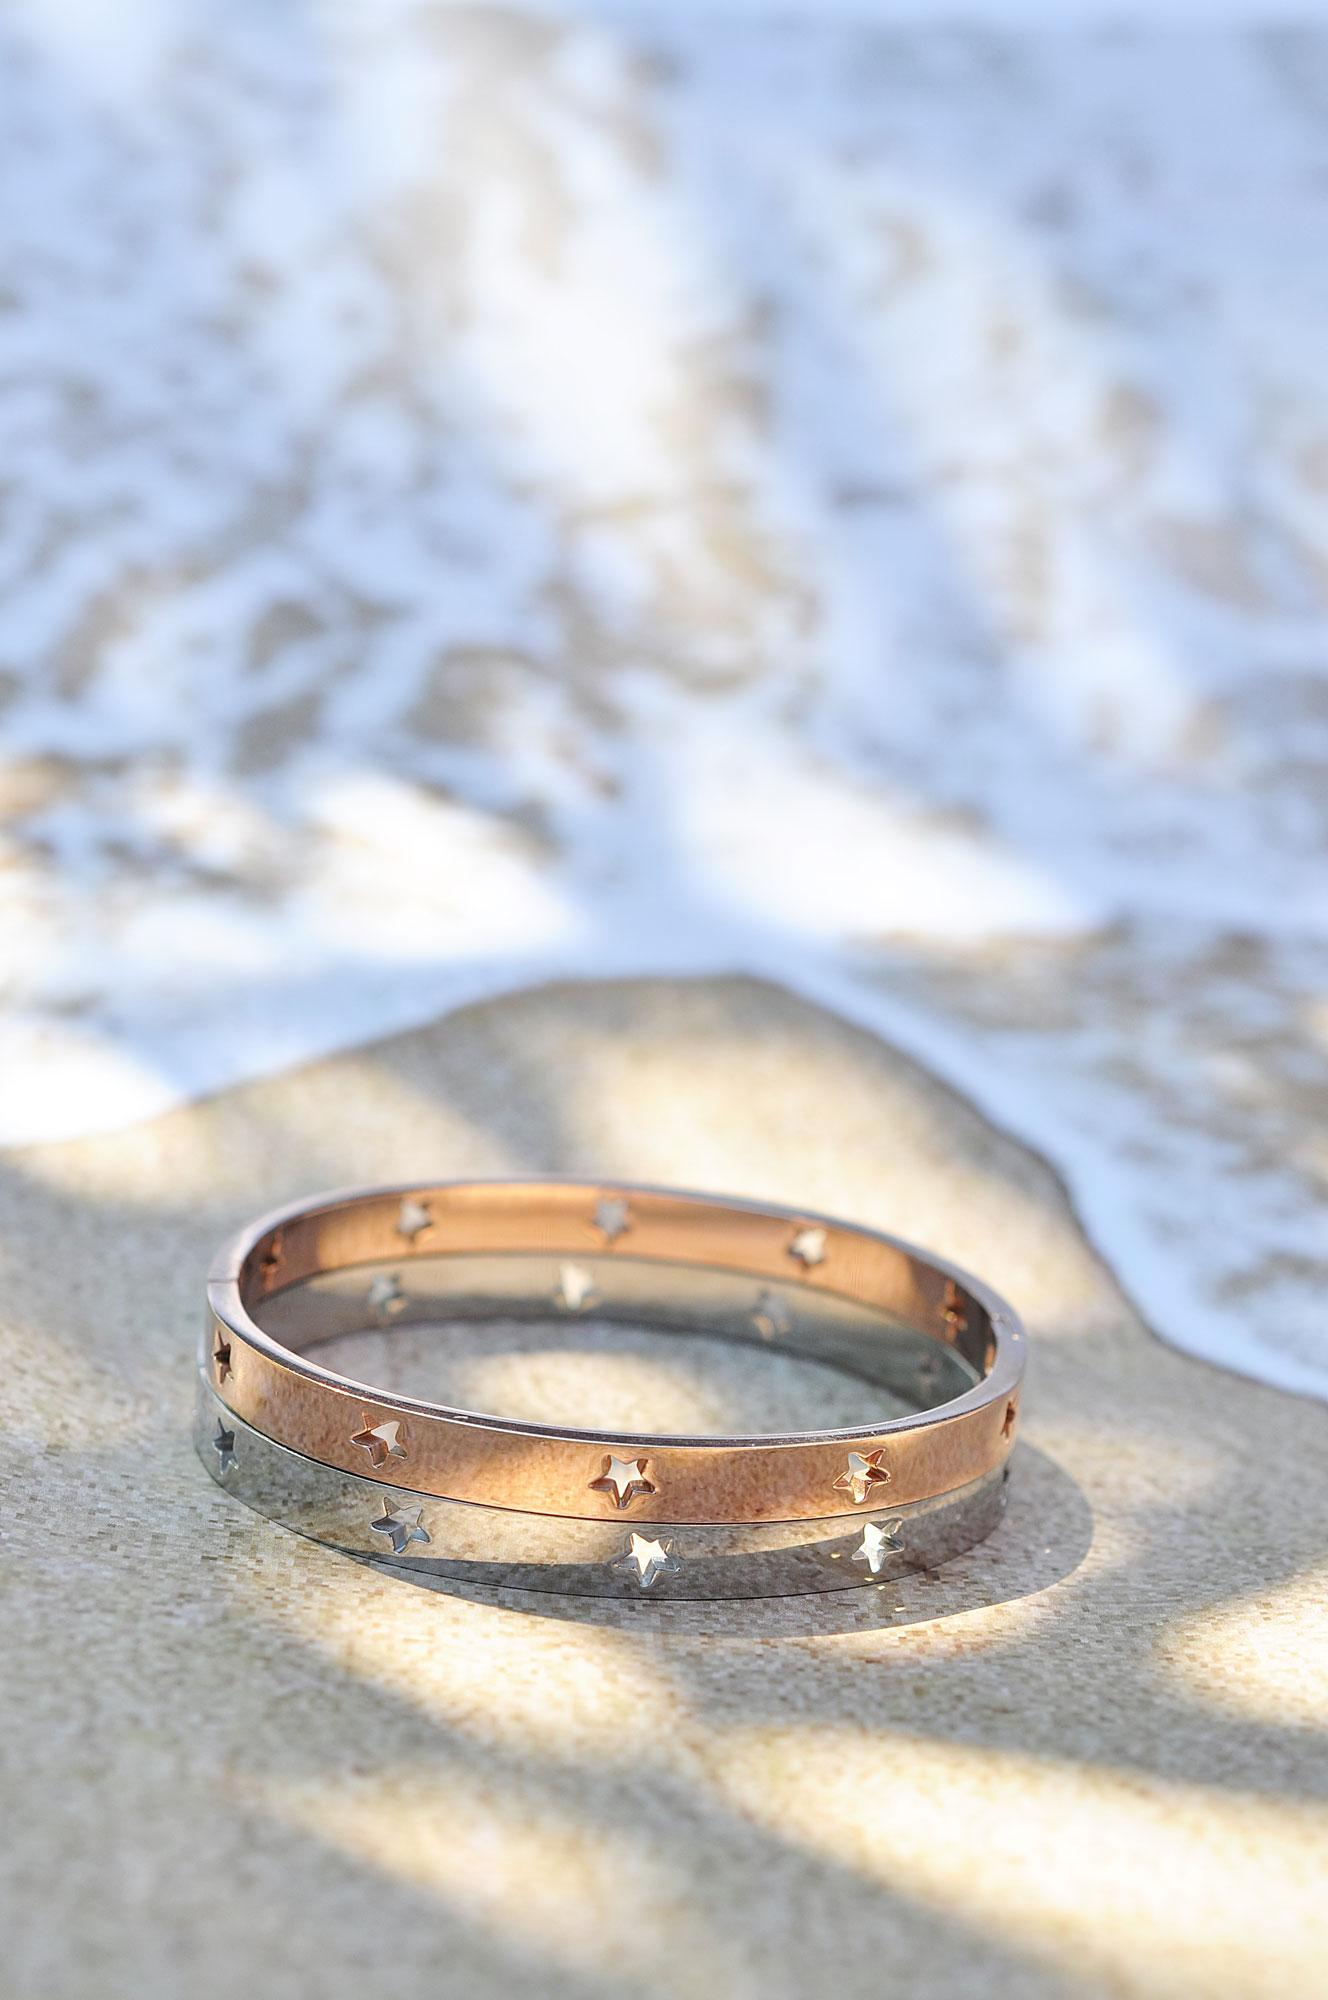 SEXY PLEXY jewelry ima novu Amalfi kolekciju